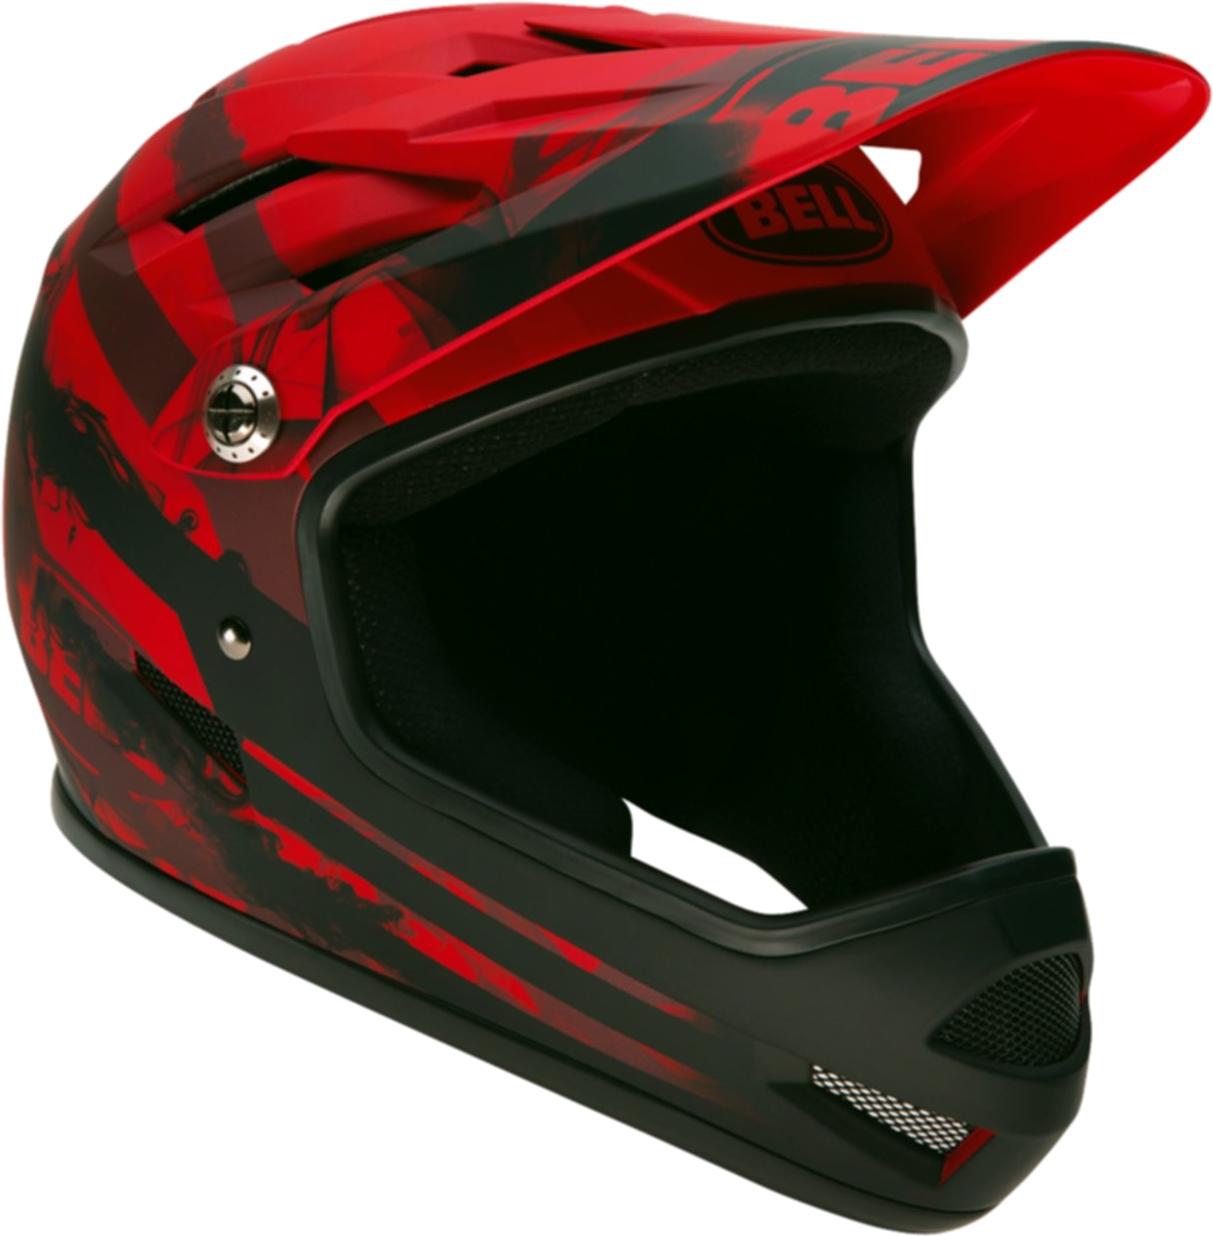 Motorcycle png image purepng. Race clipart dirt bike helmet